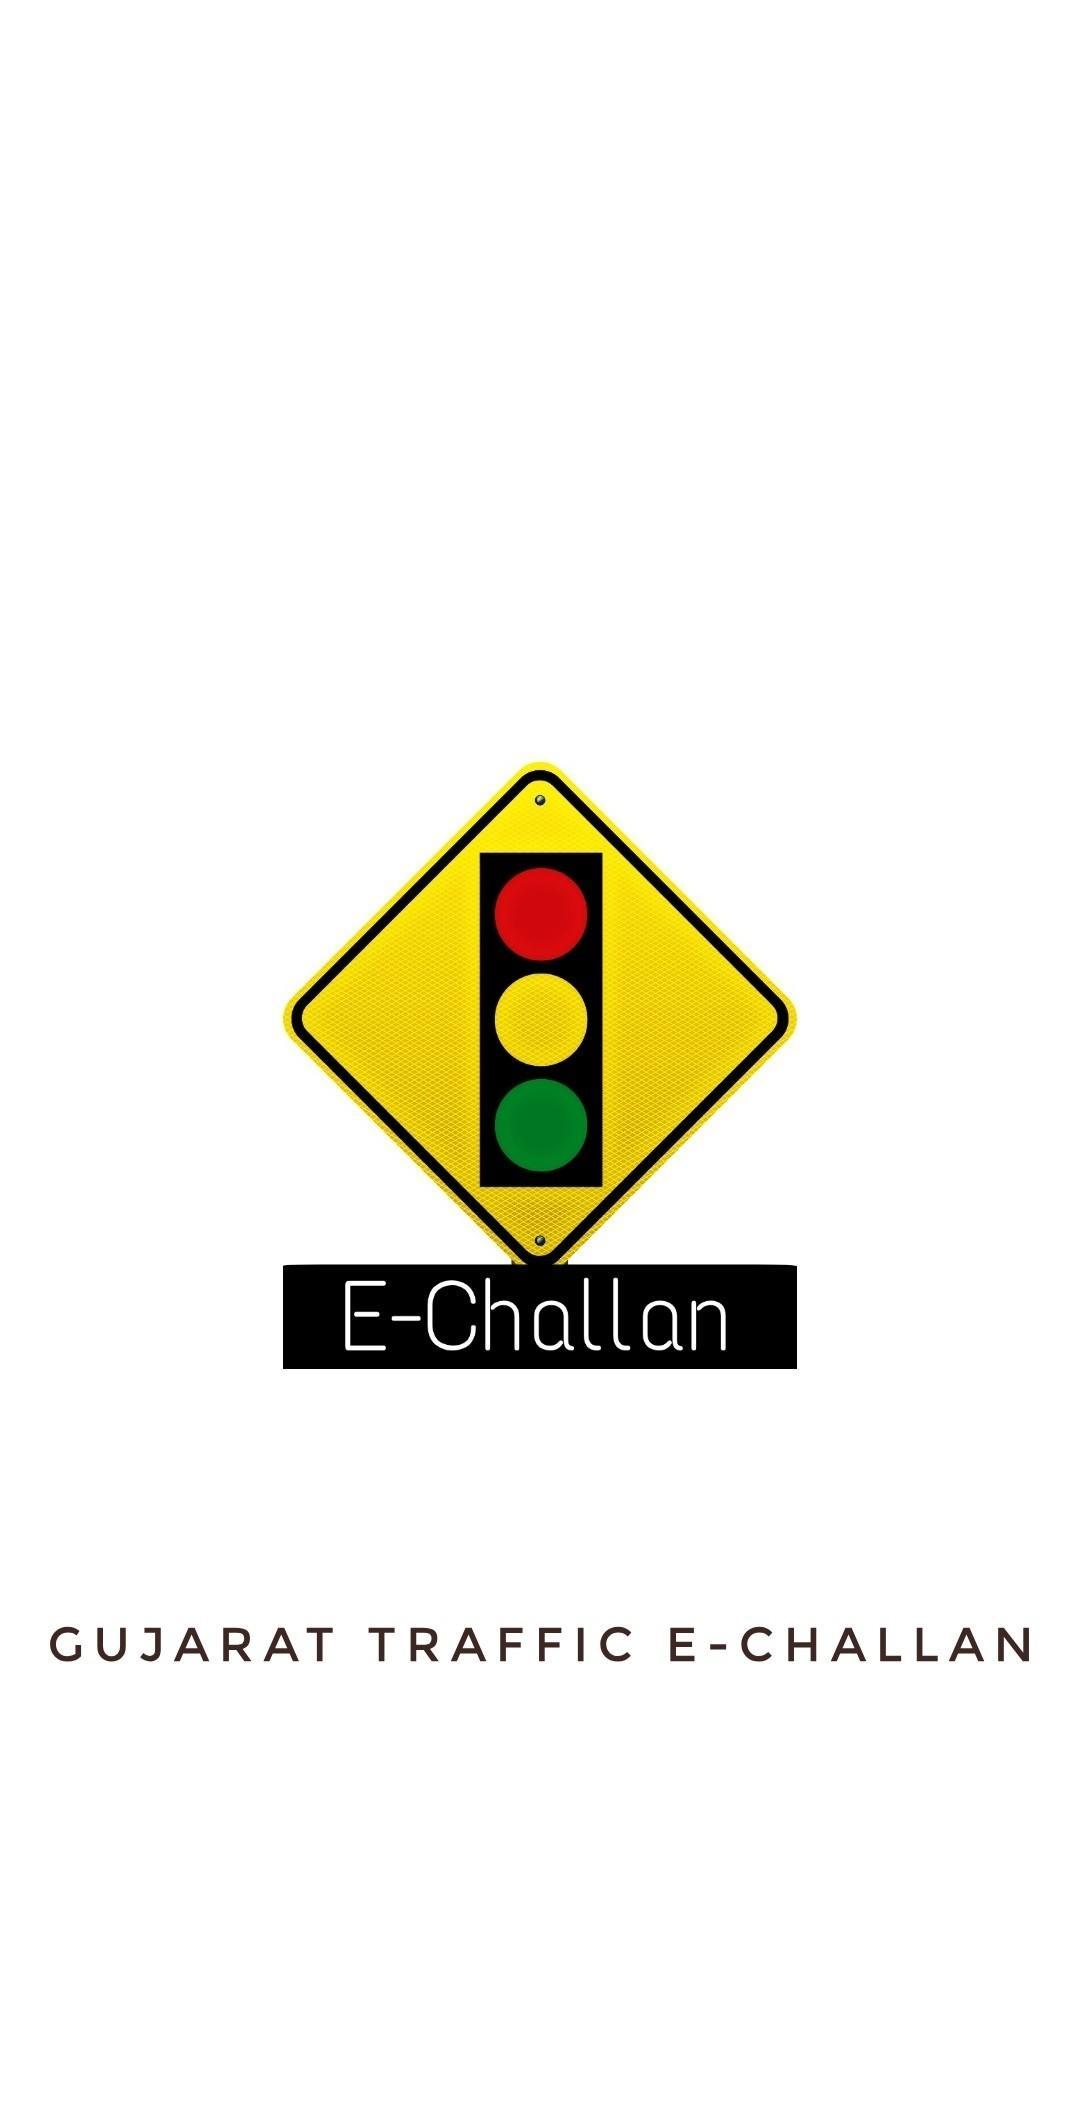 Gujarat Traffic E-Challan (Online Memo) for Android - APK